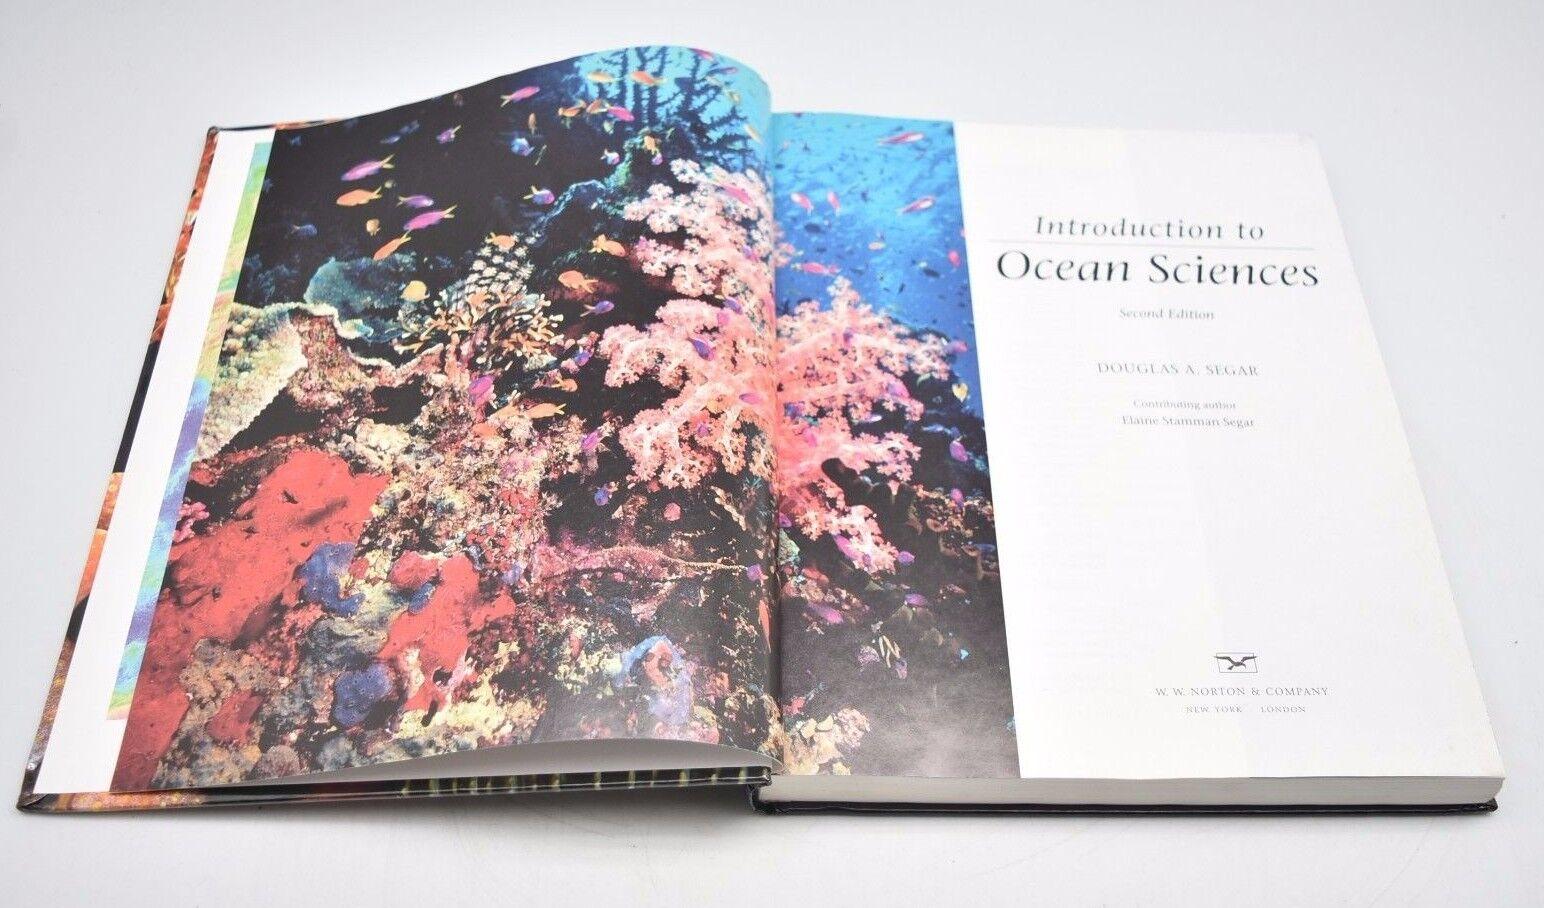 introduction to ocean sciences 2nd edition part 1 douglas a segar